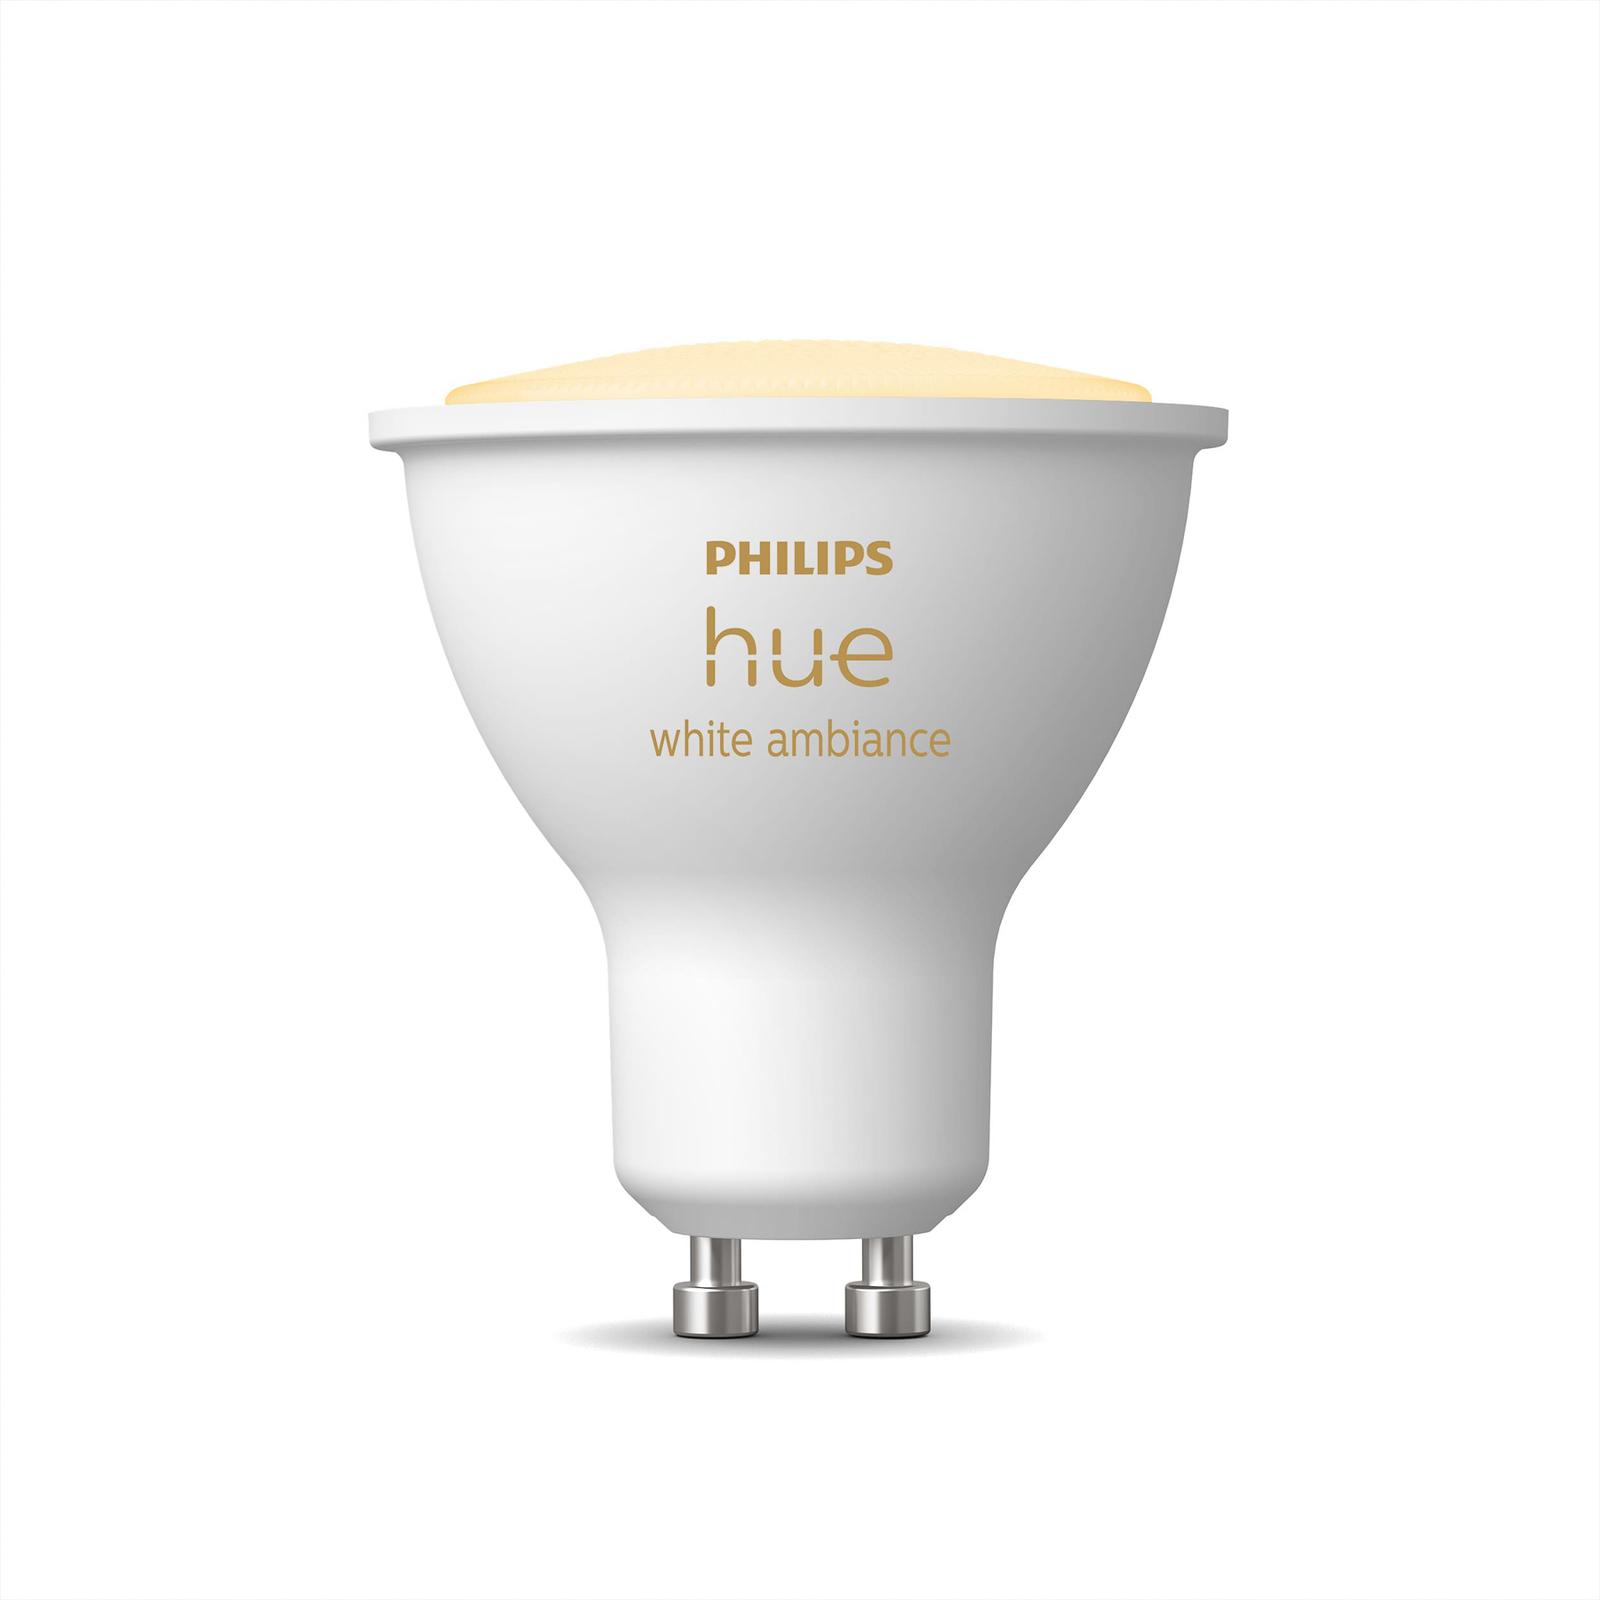 Philips Hue White Ambiance 5 W GU10 LED-lampa